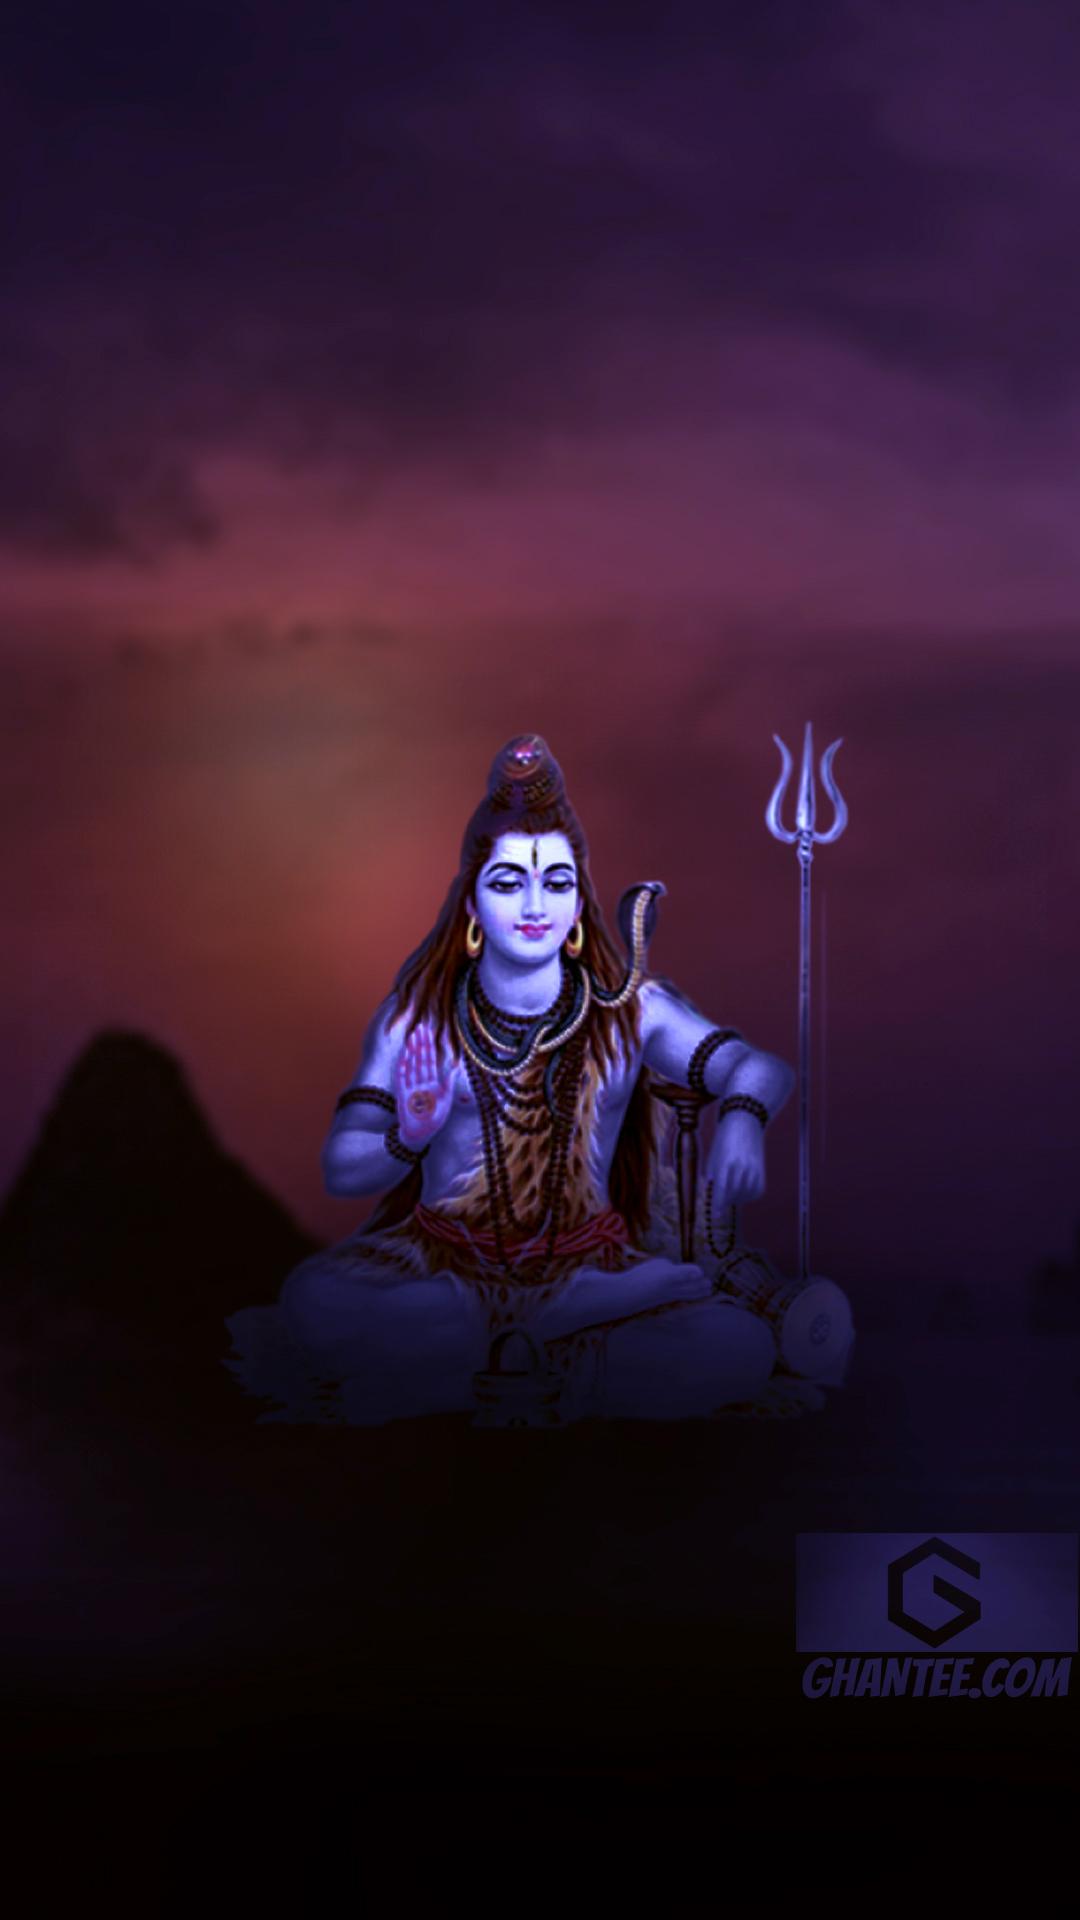 mahadev shravan month hd image